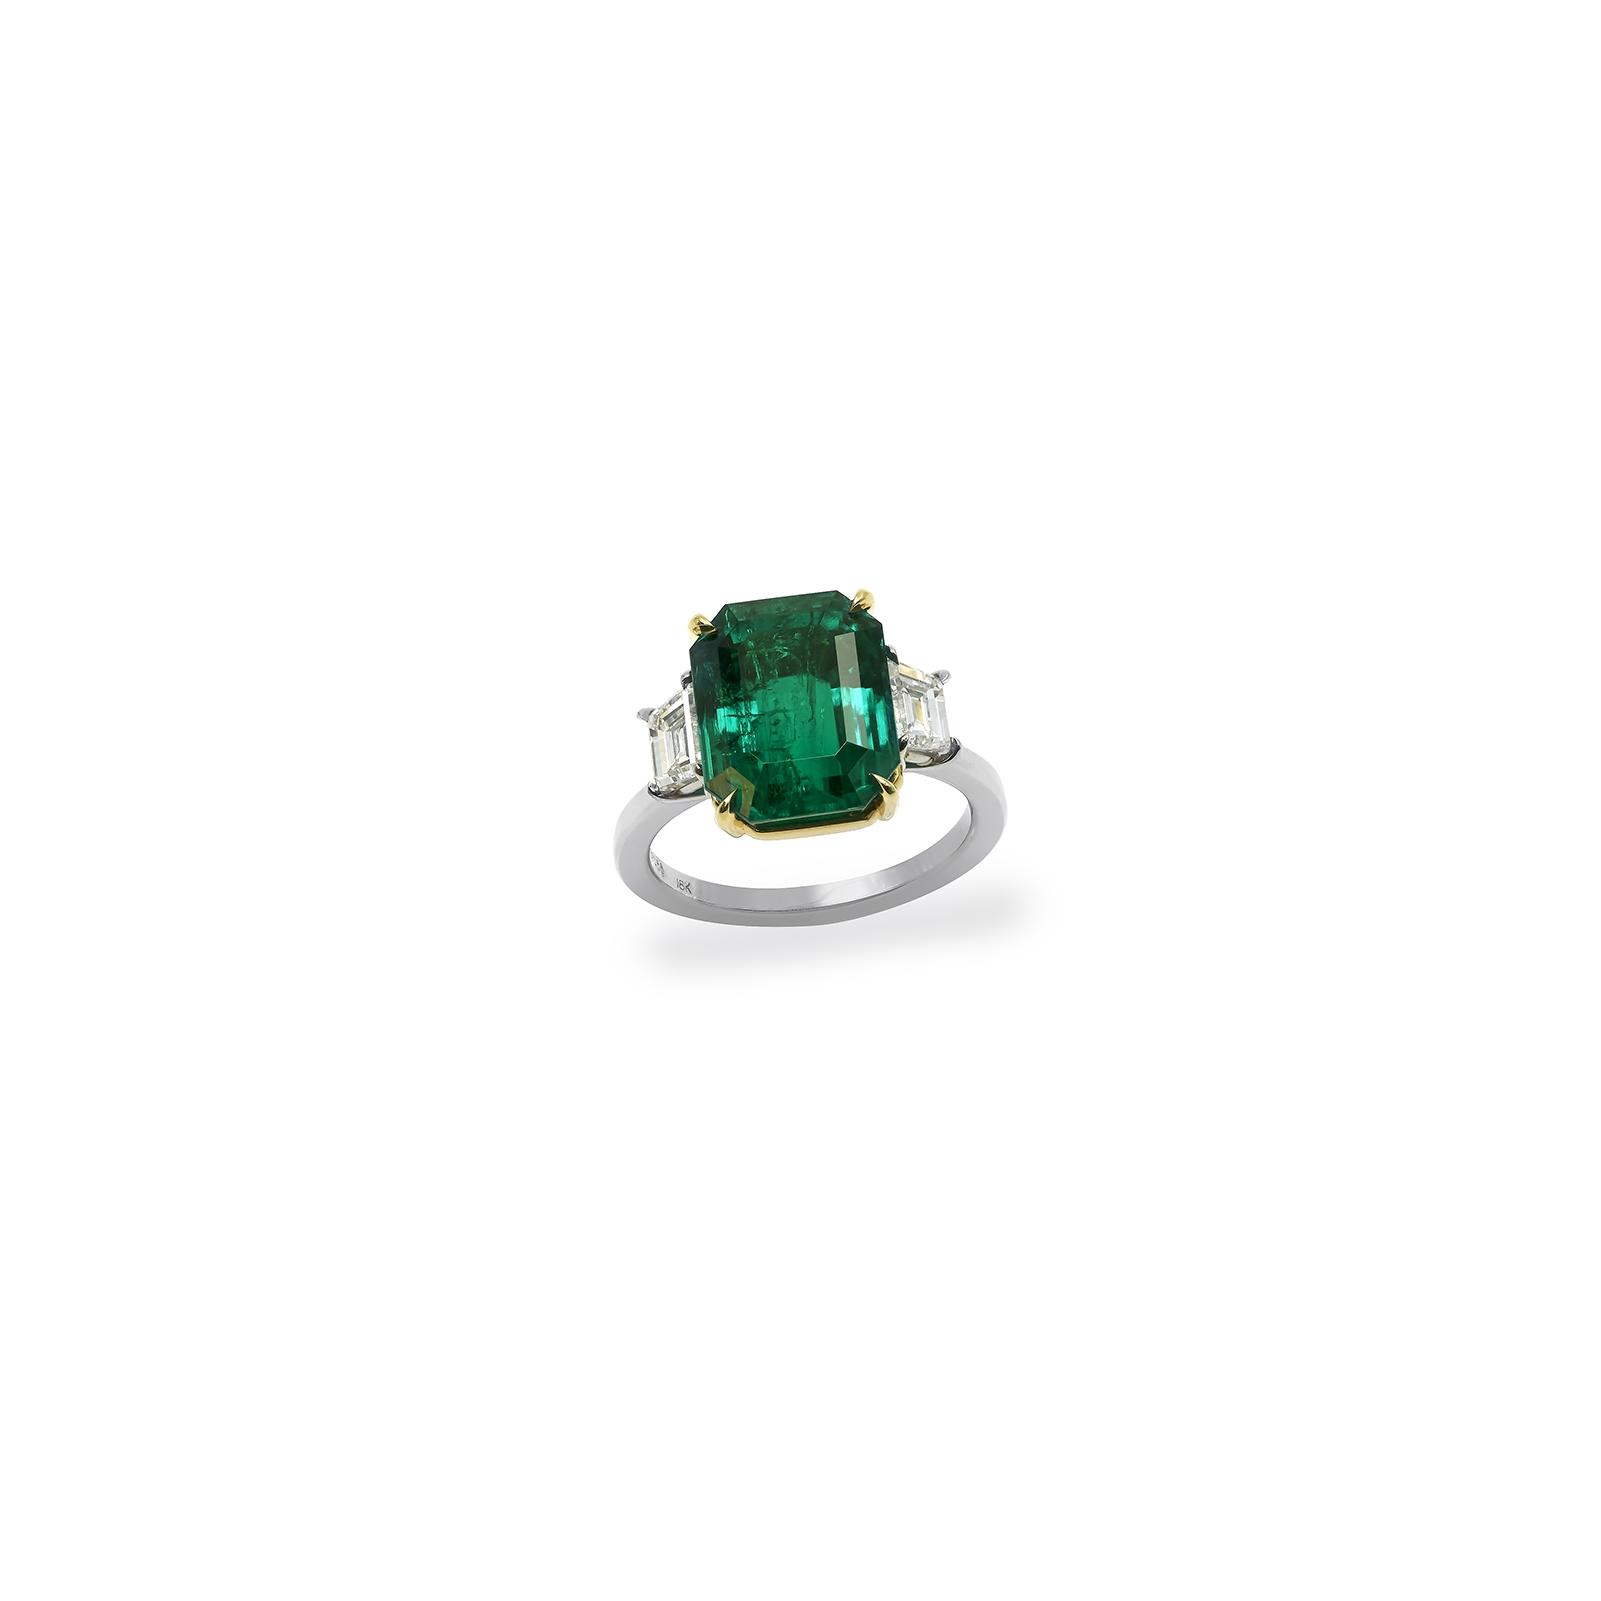 7 carat emerald cut ring